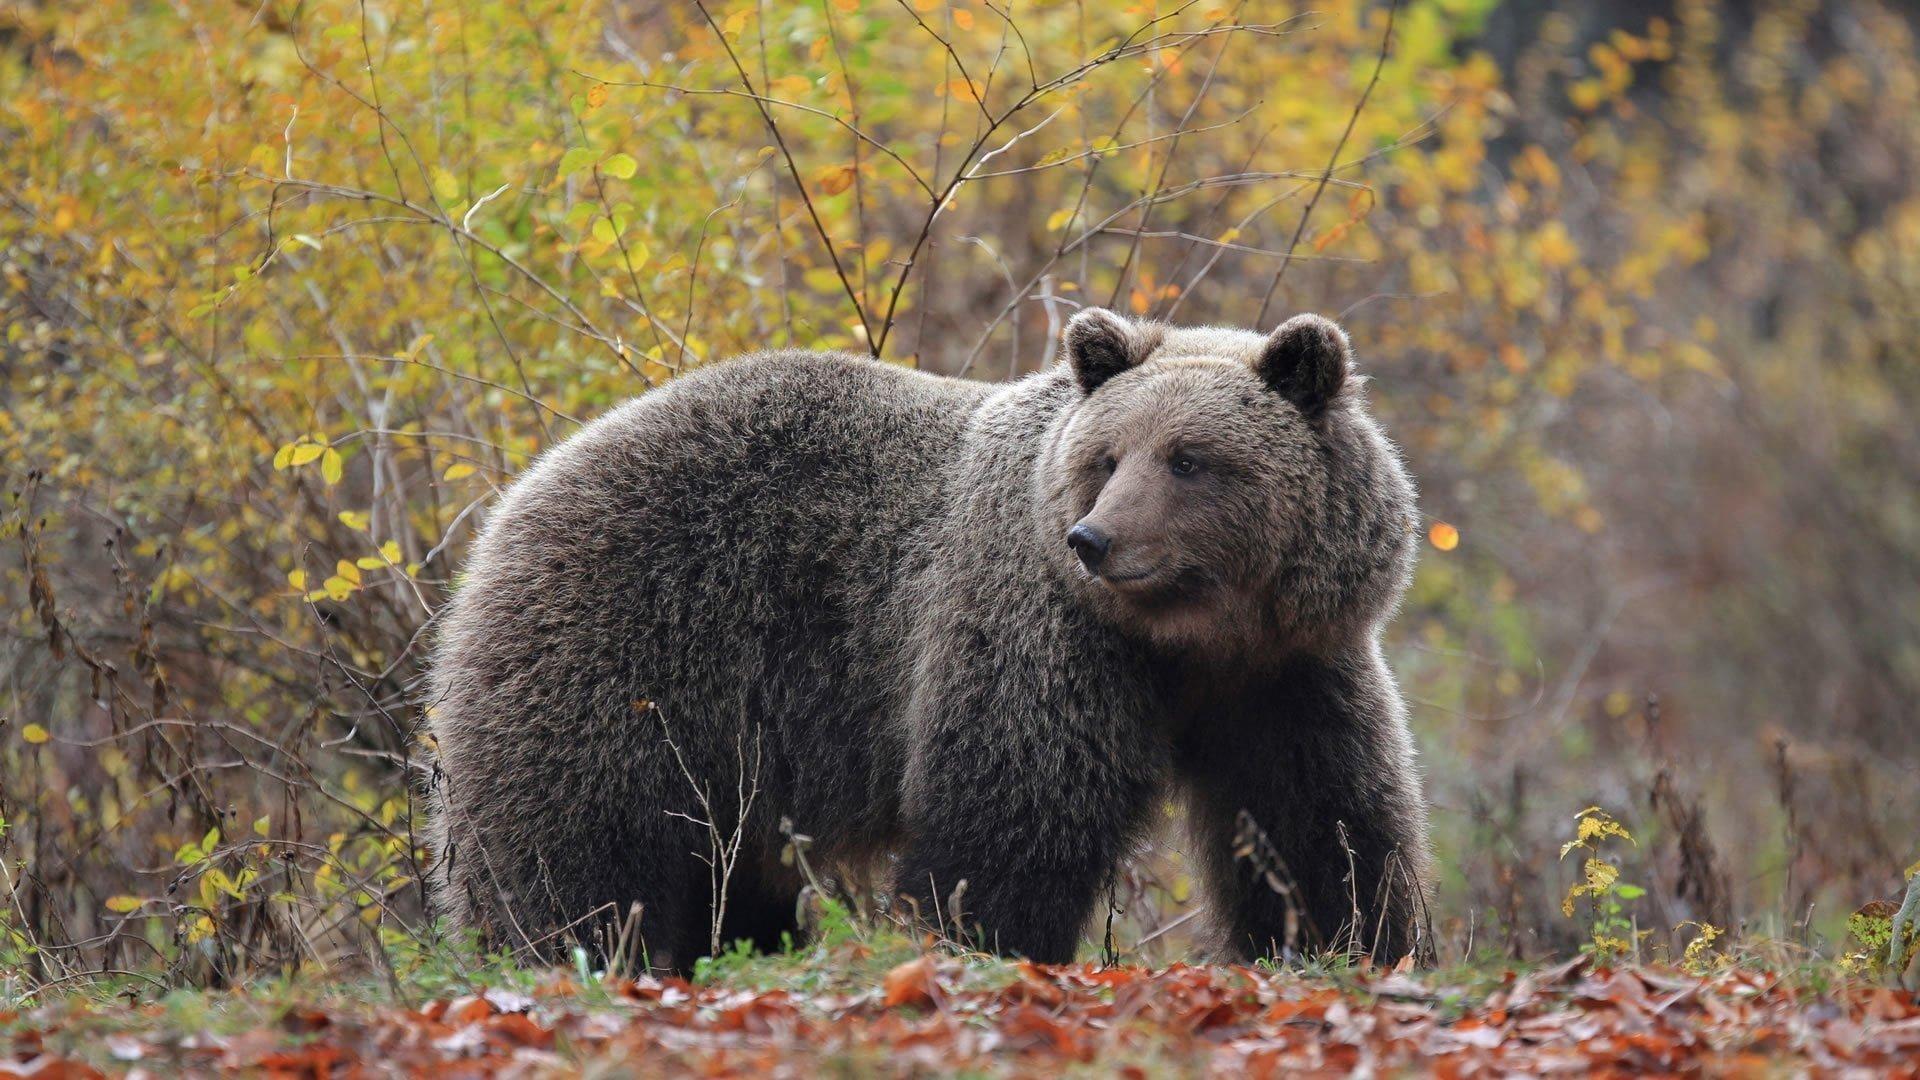 Green adventure Brown bear